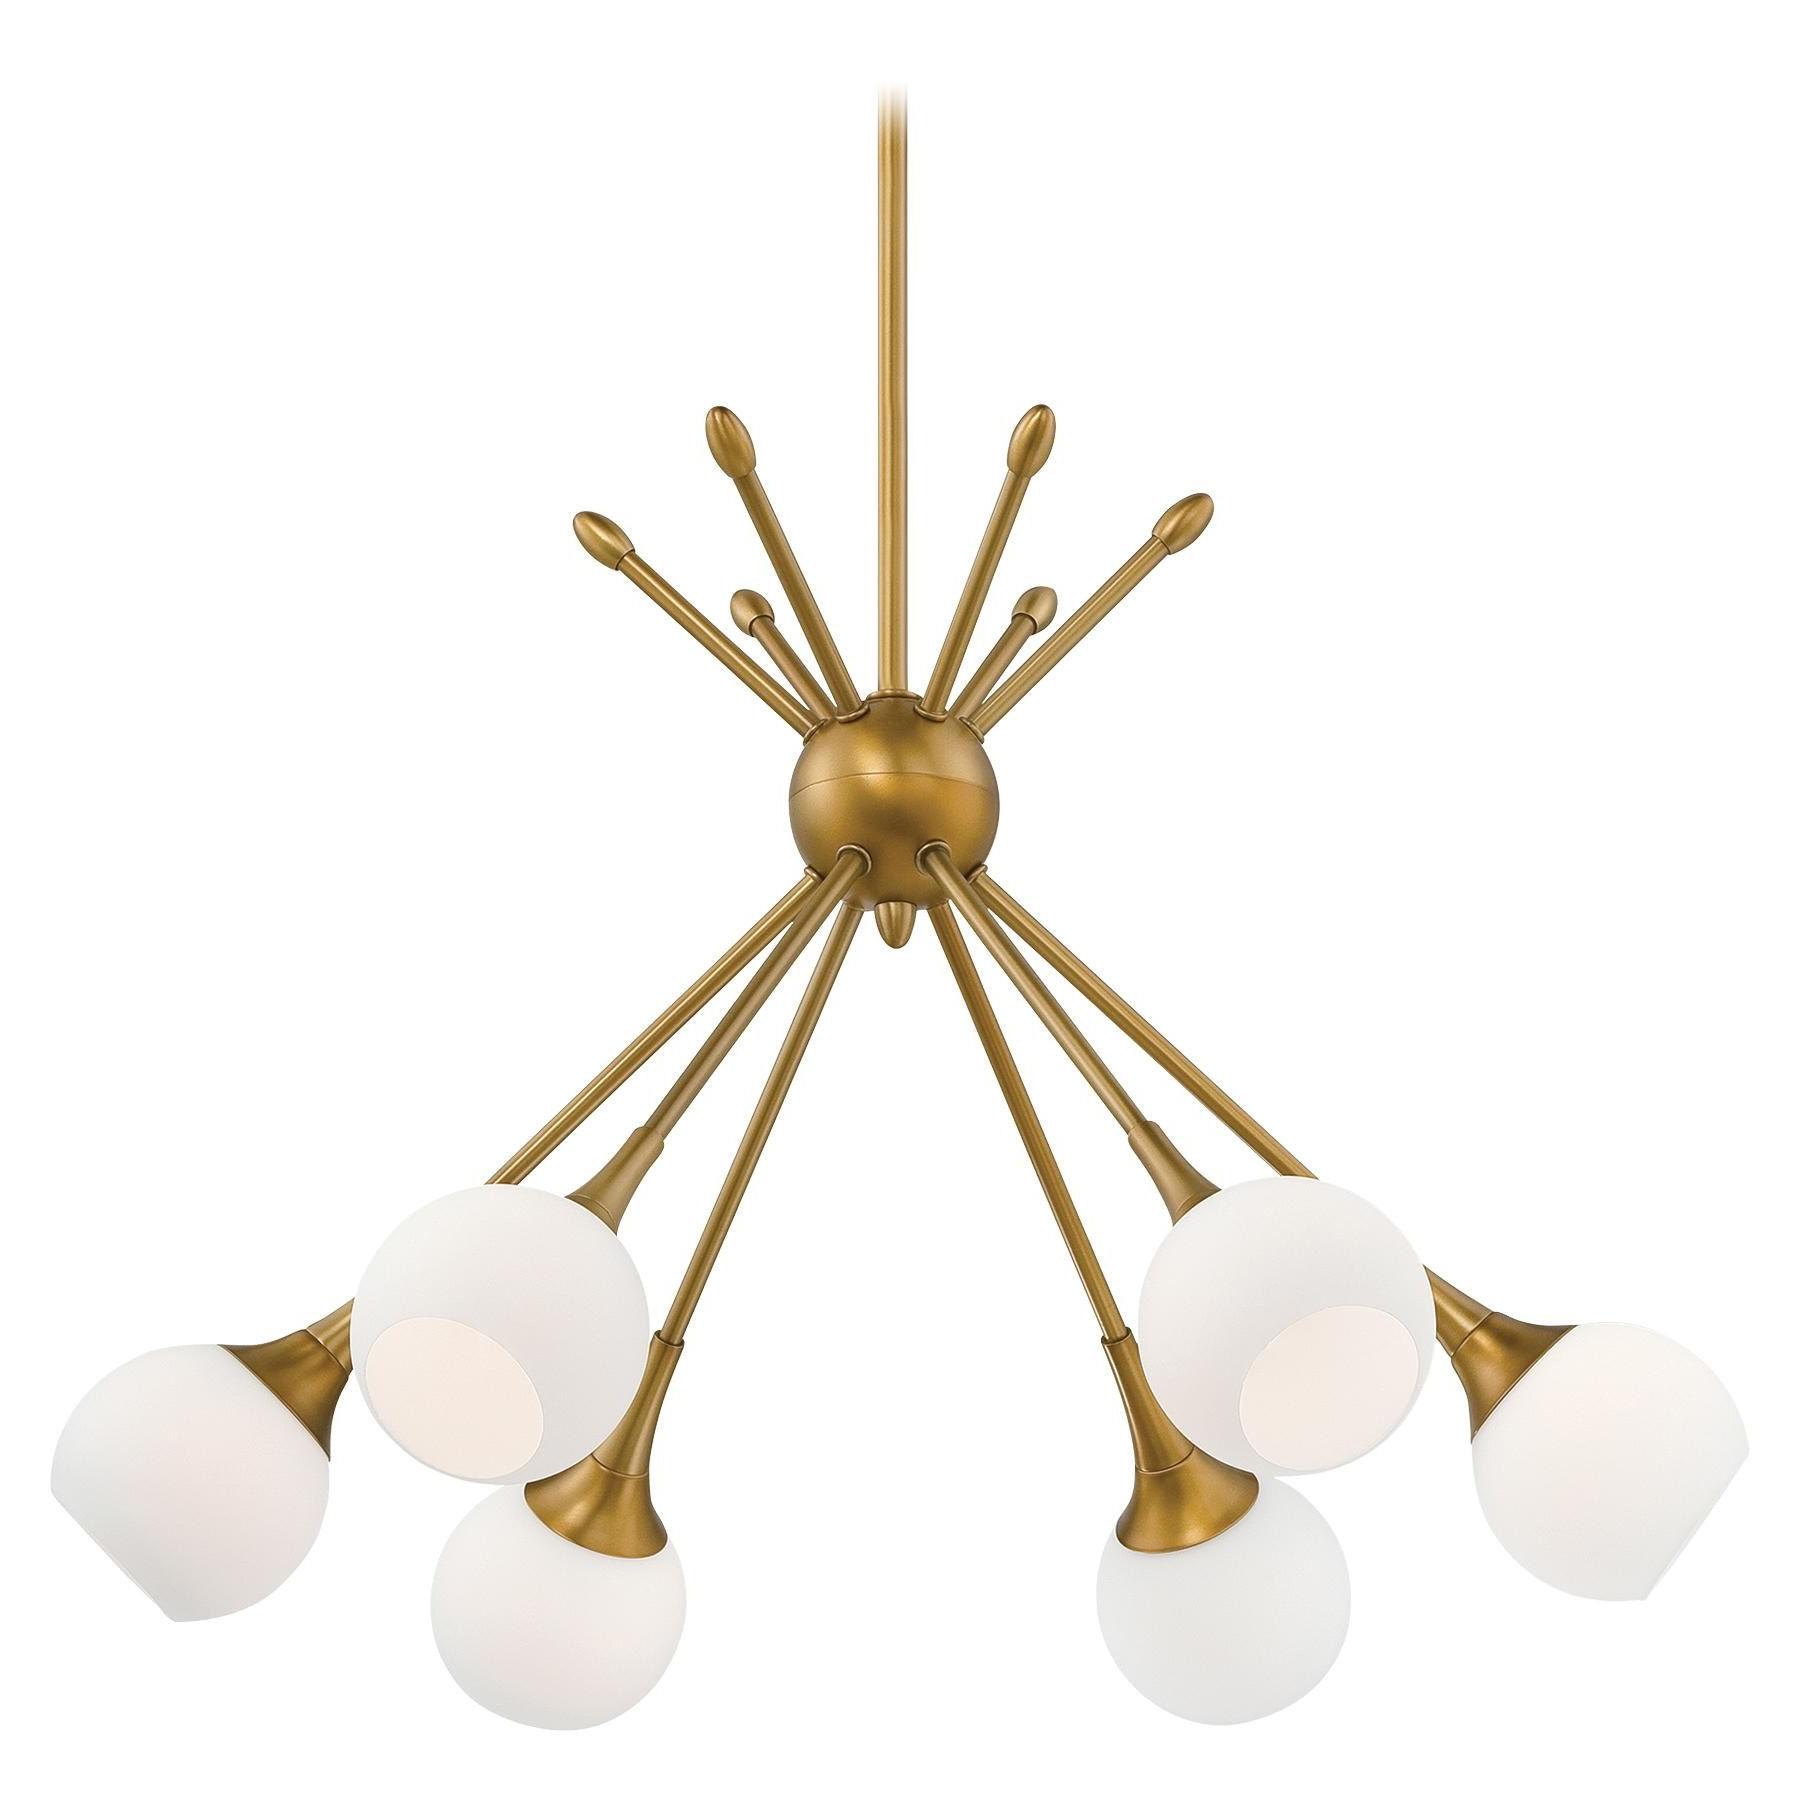 Lighting Intended For Johanne 6 Light Sputnik Chandeliers (View 17 of 25)